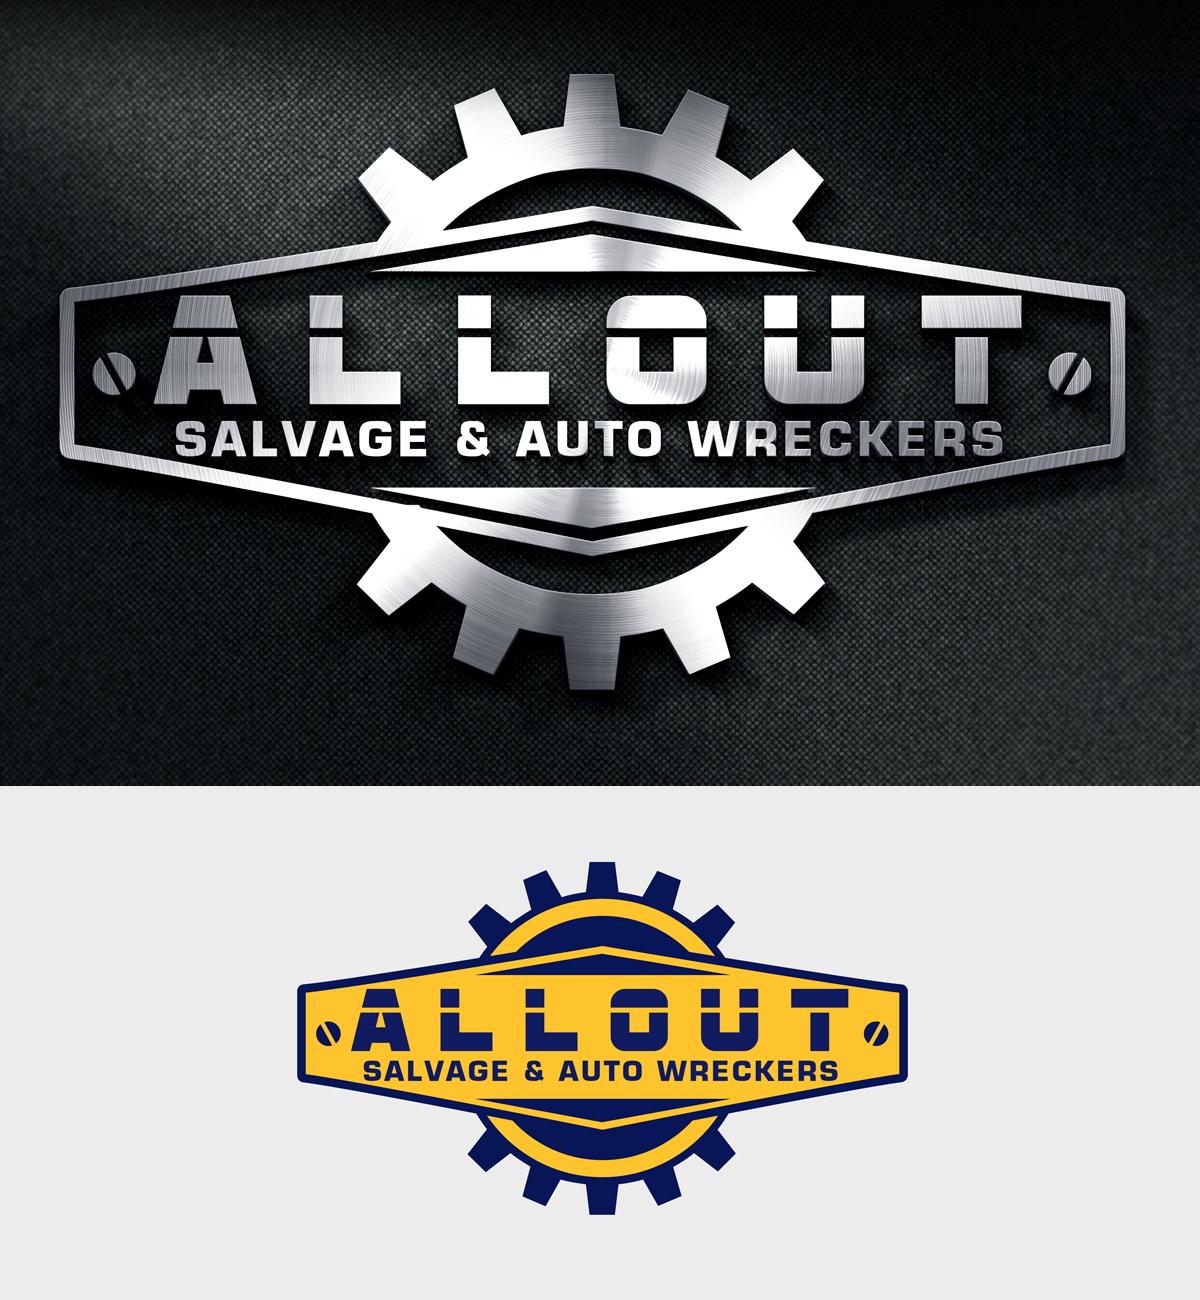 Logo Design by Robert Turla - Entry No. 18 in the Logo Design Contest Inspiring Logo Design for Allout Salvage & Auto Wreckers.